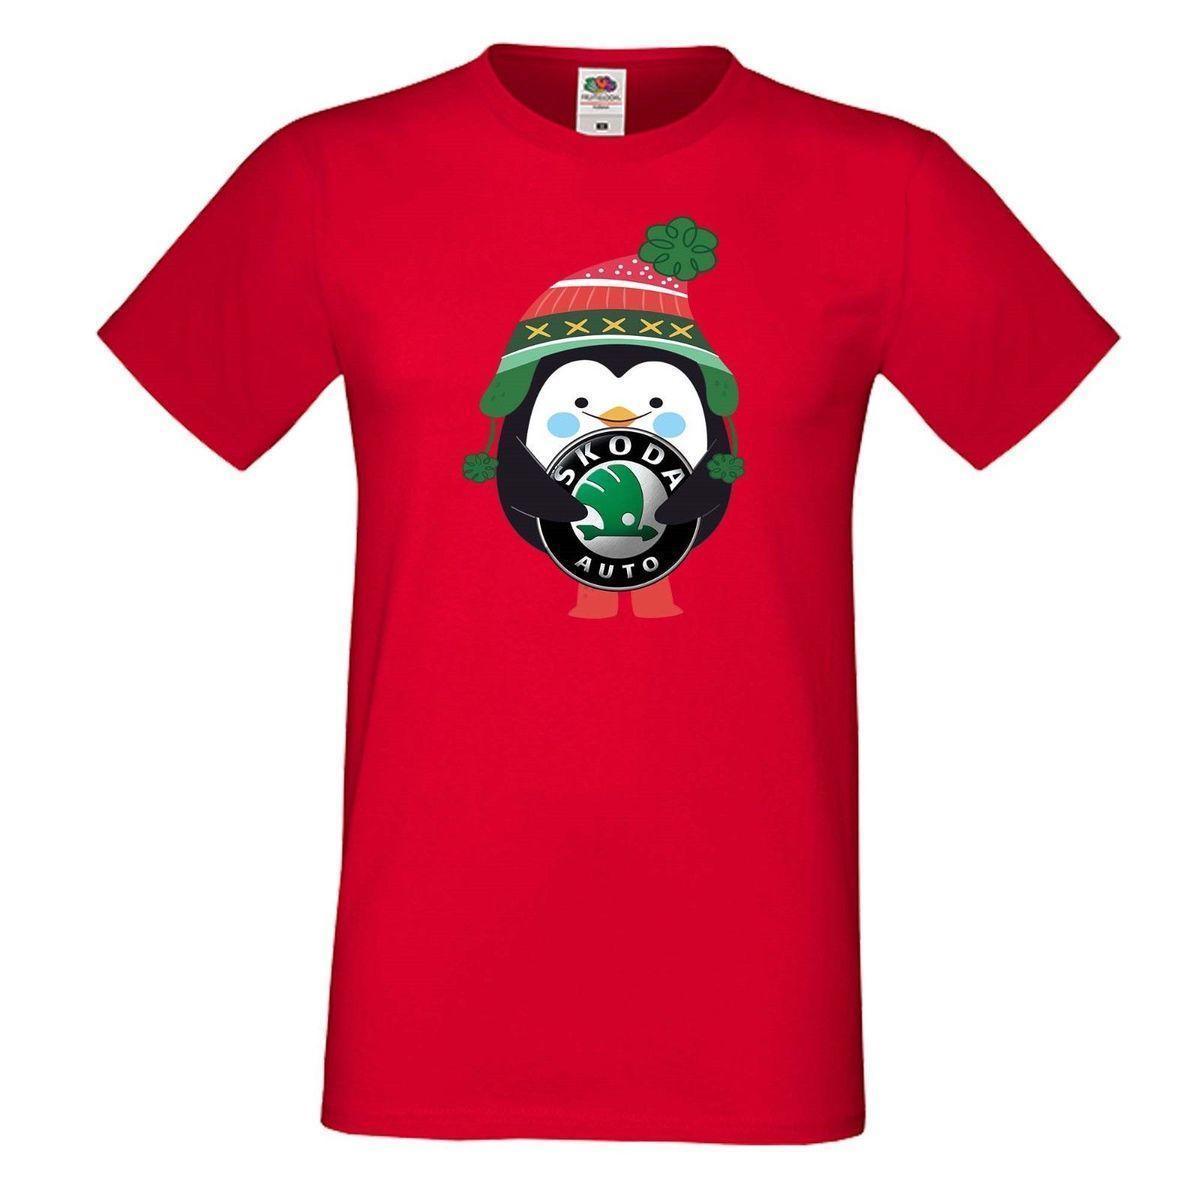 T Shirt Weihnachten.Herren Men T Shirt Skoda Penguin Winter Gift Geschenk Weihnachten